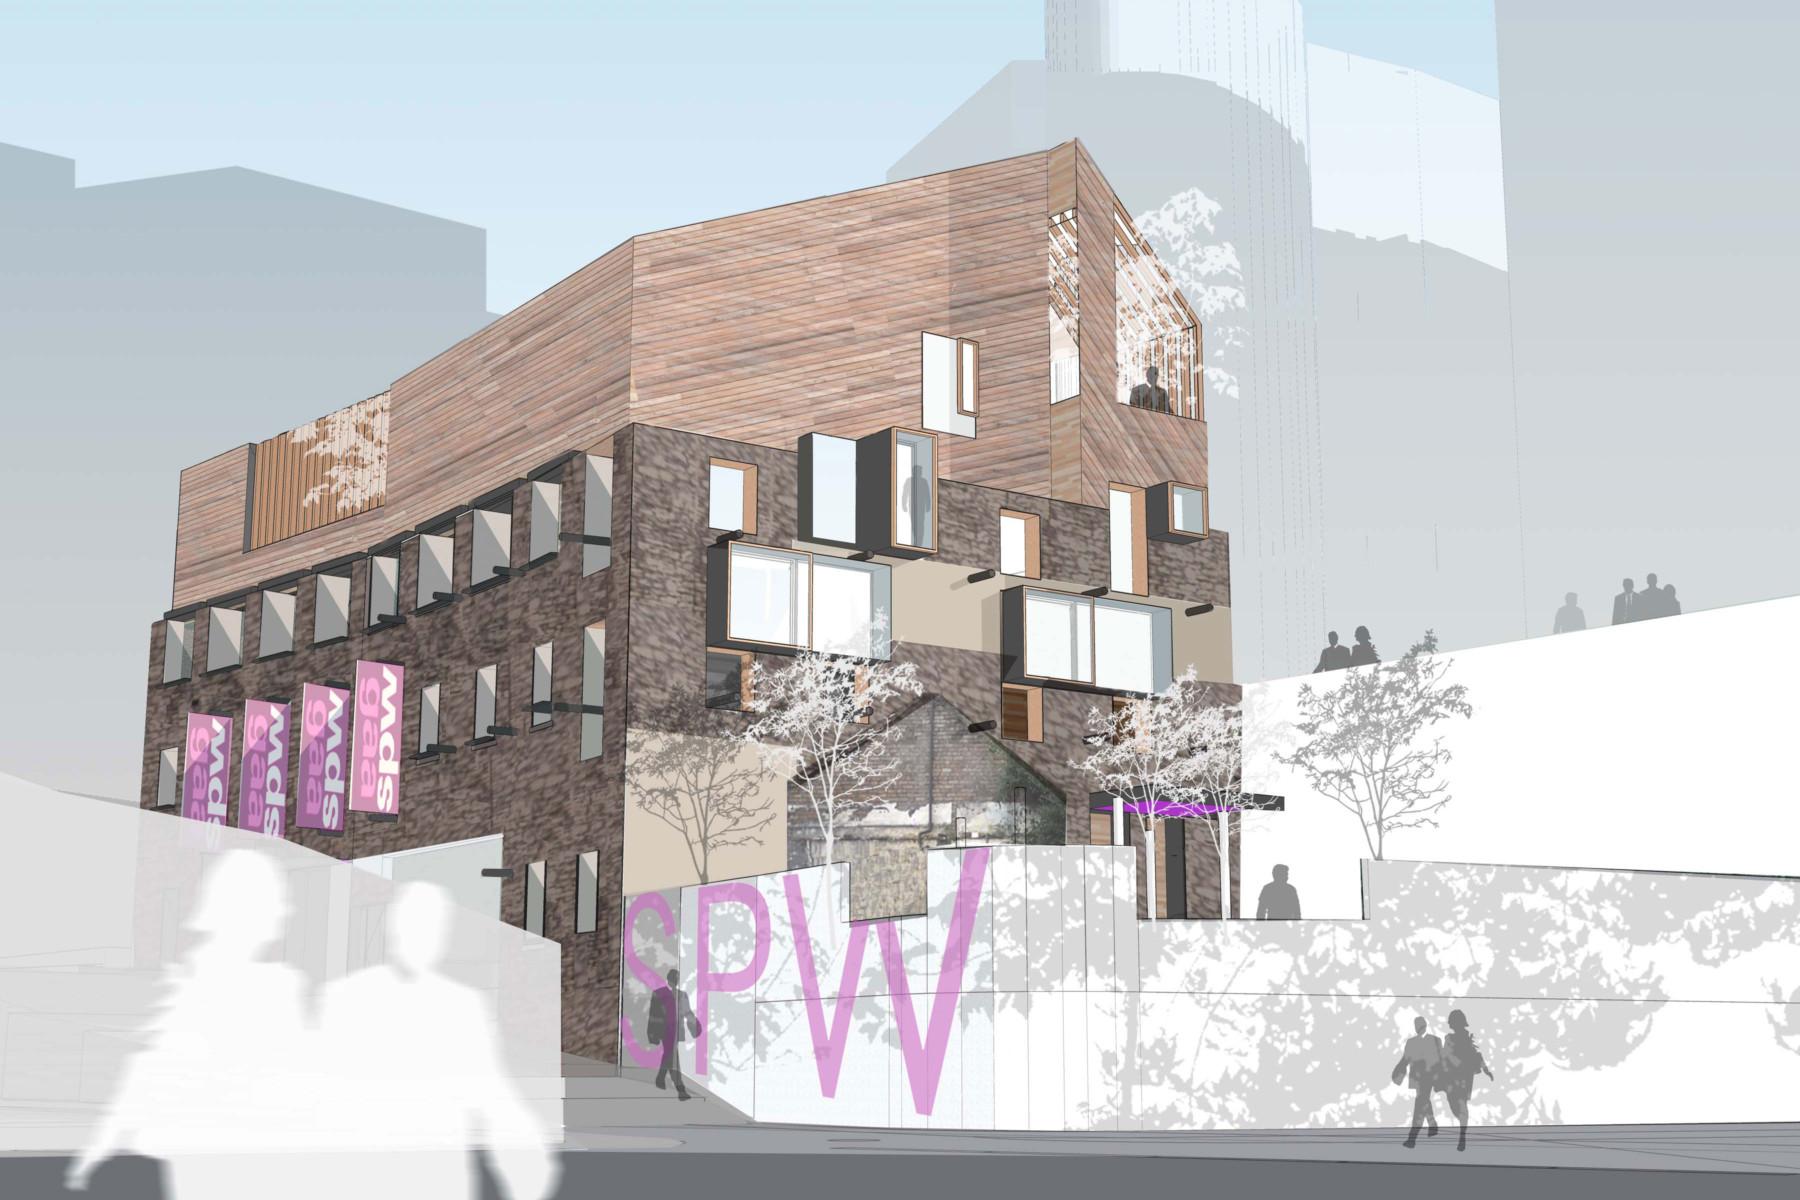 Sarah-Wigglesworth-Architects Swansea-Print-Works West View 3600